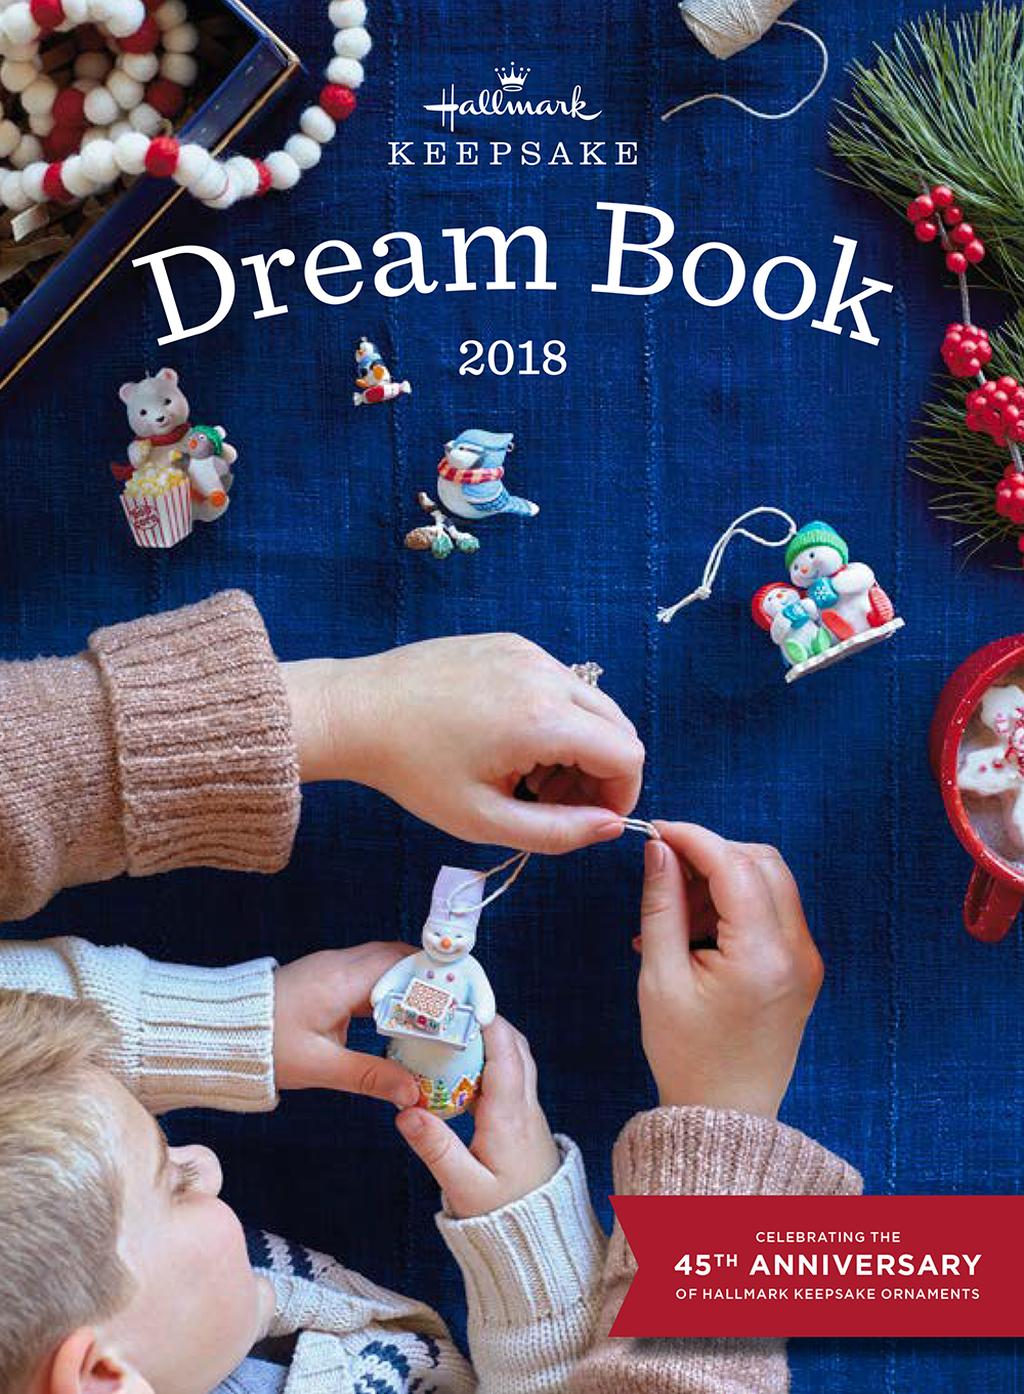 Books For Christmas 2019 Hallmark Dream Book 2019 | Browse Keepsake Ornaments Online | Hallmark